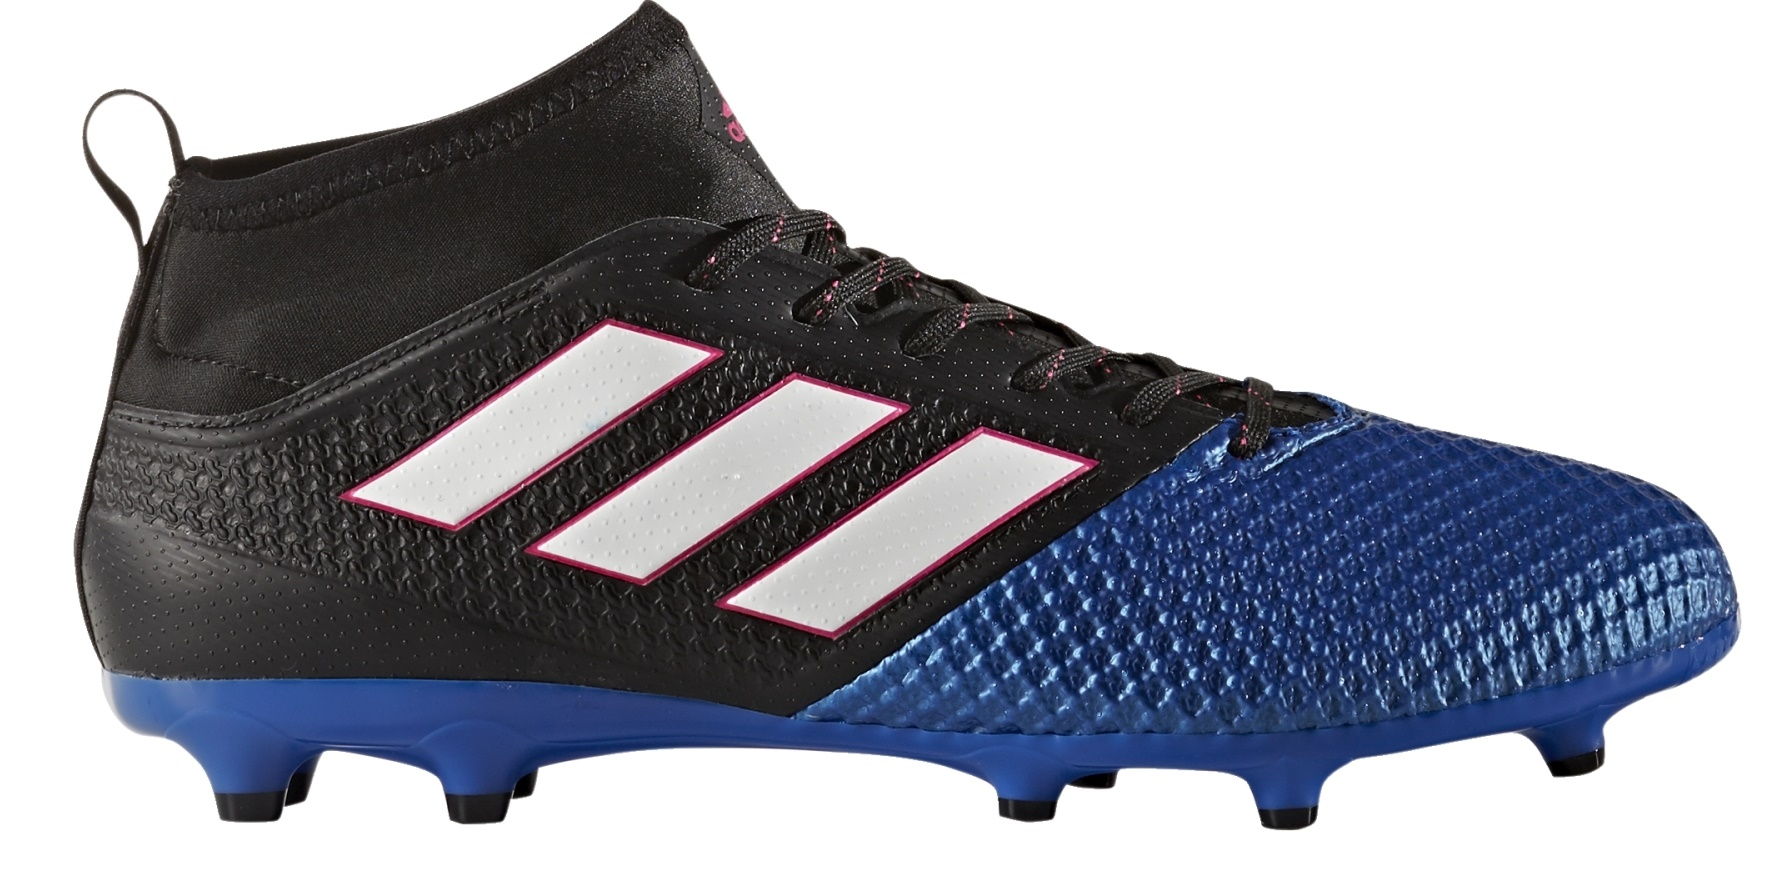 sneakers for cheap f829d 65131 Scarpe Calcio Adidas Ace 17.3 PrimeMesh FG Blue Blast Pack colore Blu  Azzurro - Adidas - SportIT.com